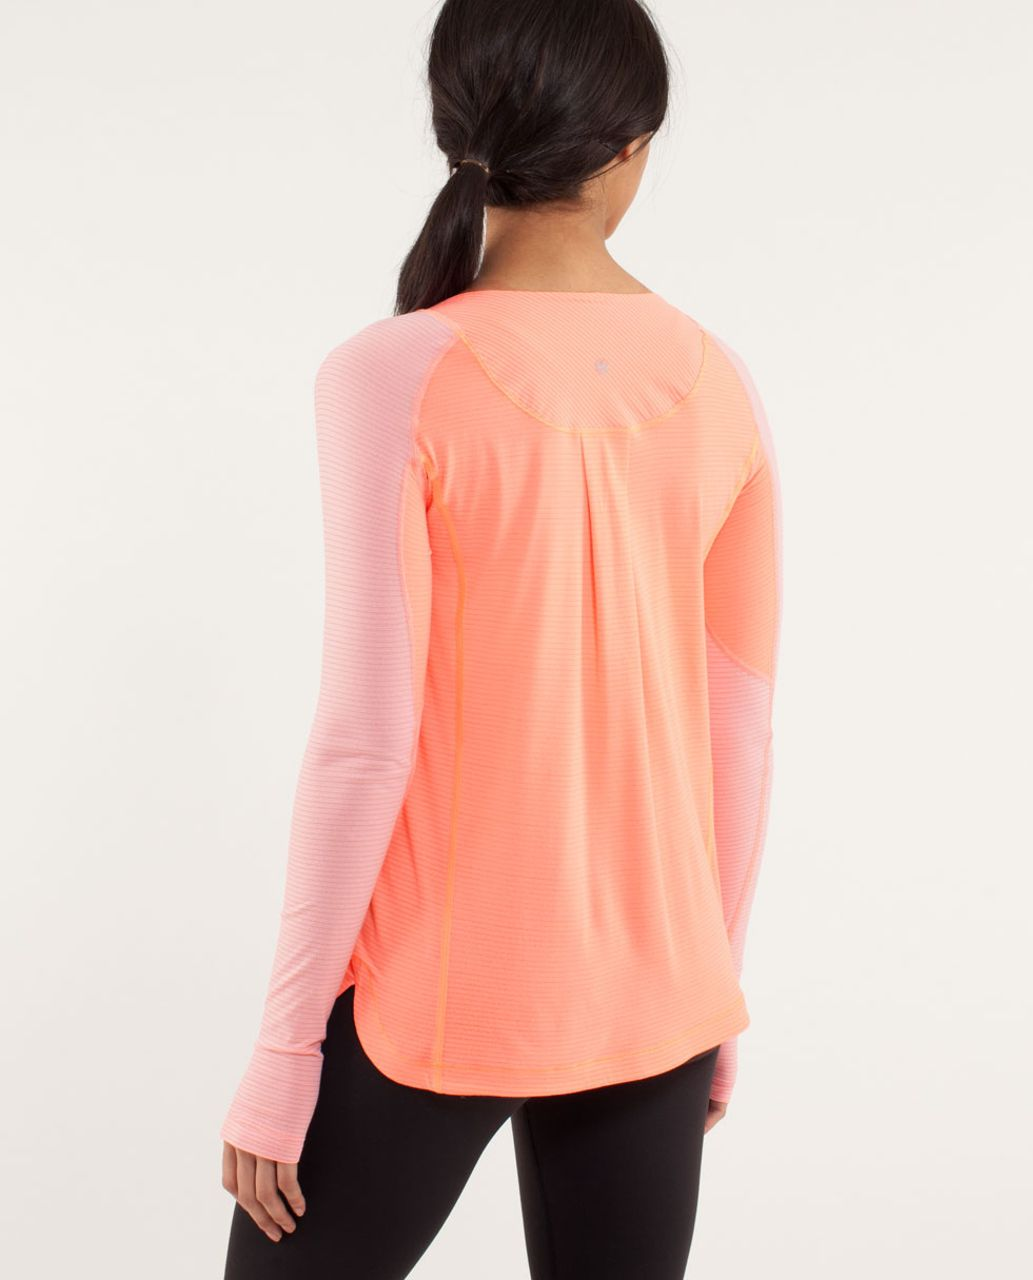 Lululemon Run:  Turn It Up Long Sleeve - Pop Orange / Dune / Wagon Stripe Pop Orange